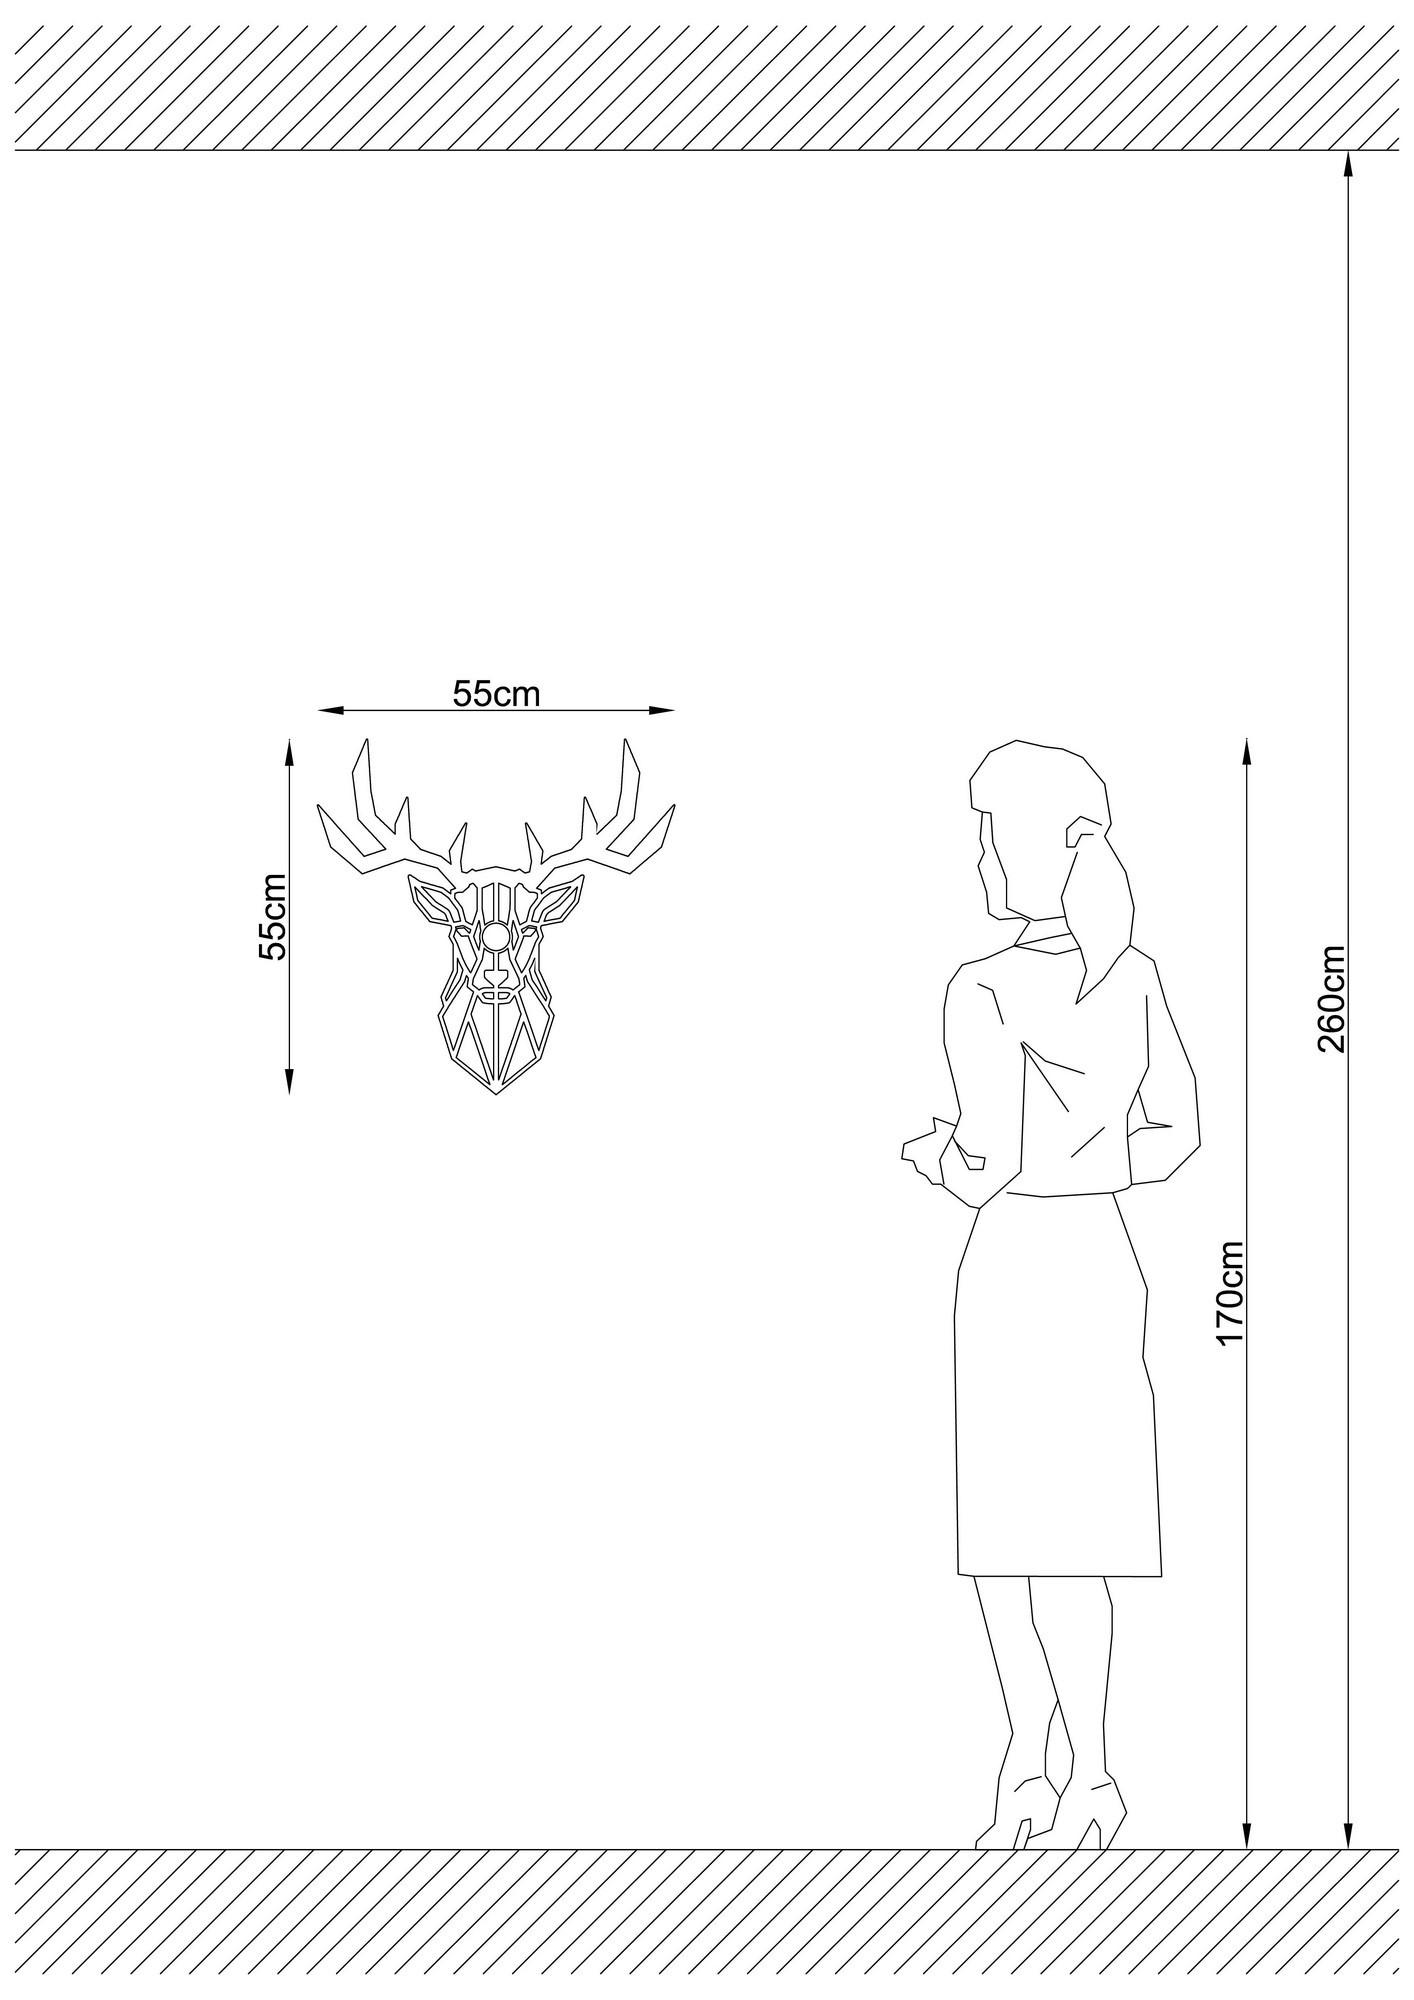 LED industriële wanddeco lamp dieren - Deer - dimbaar - E27 fitting - afmetingen